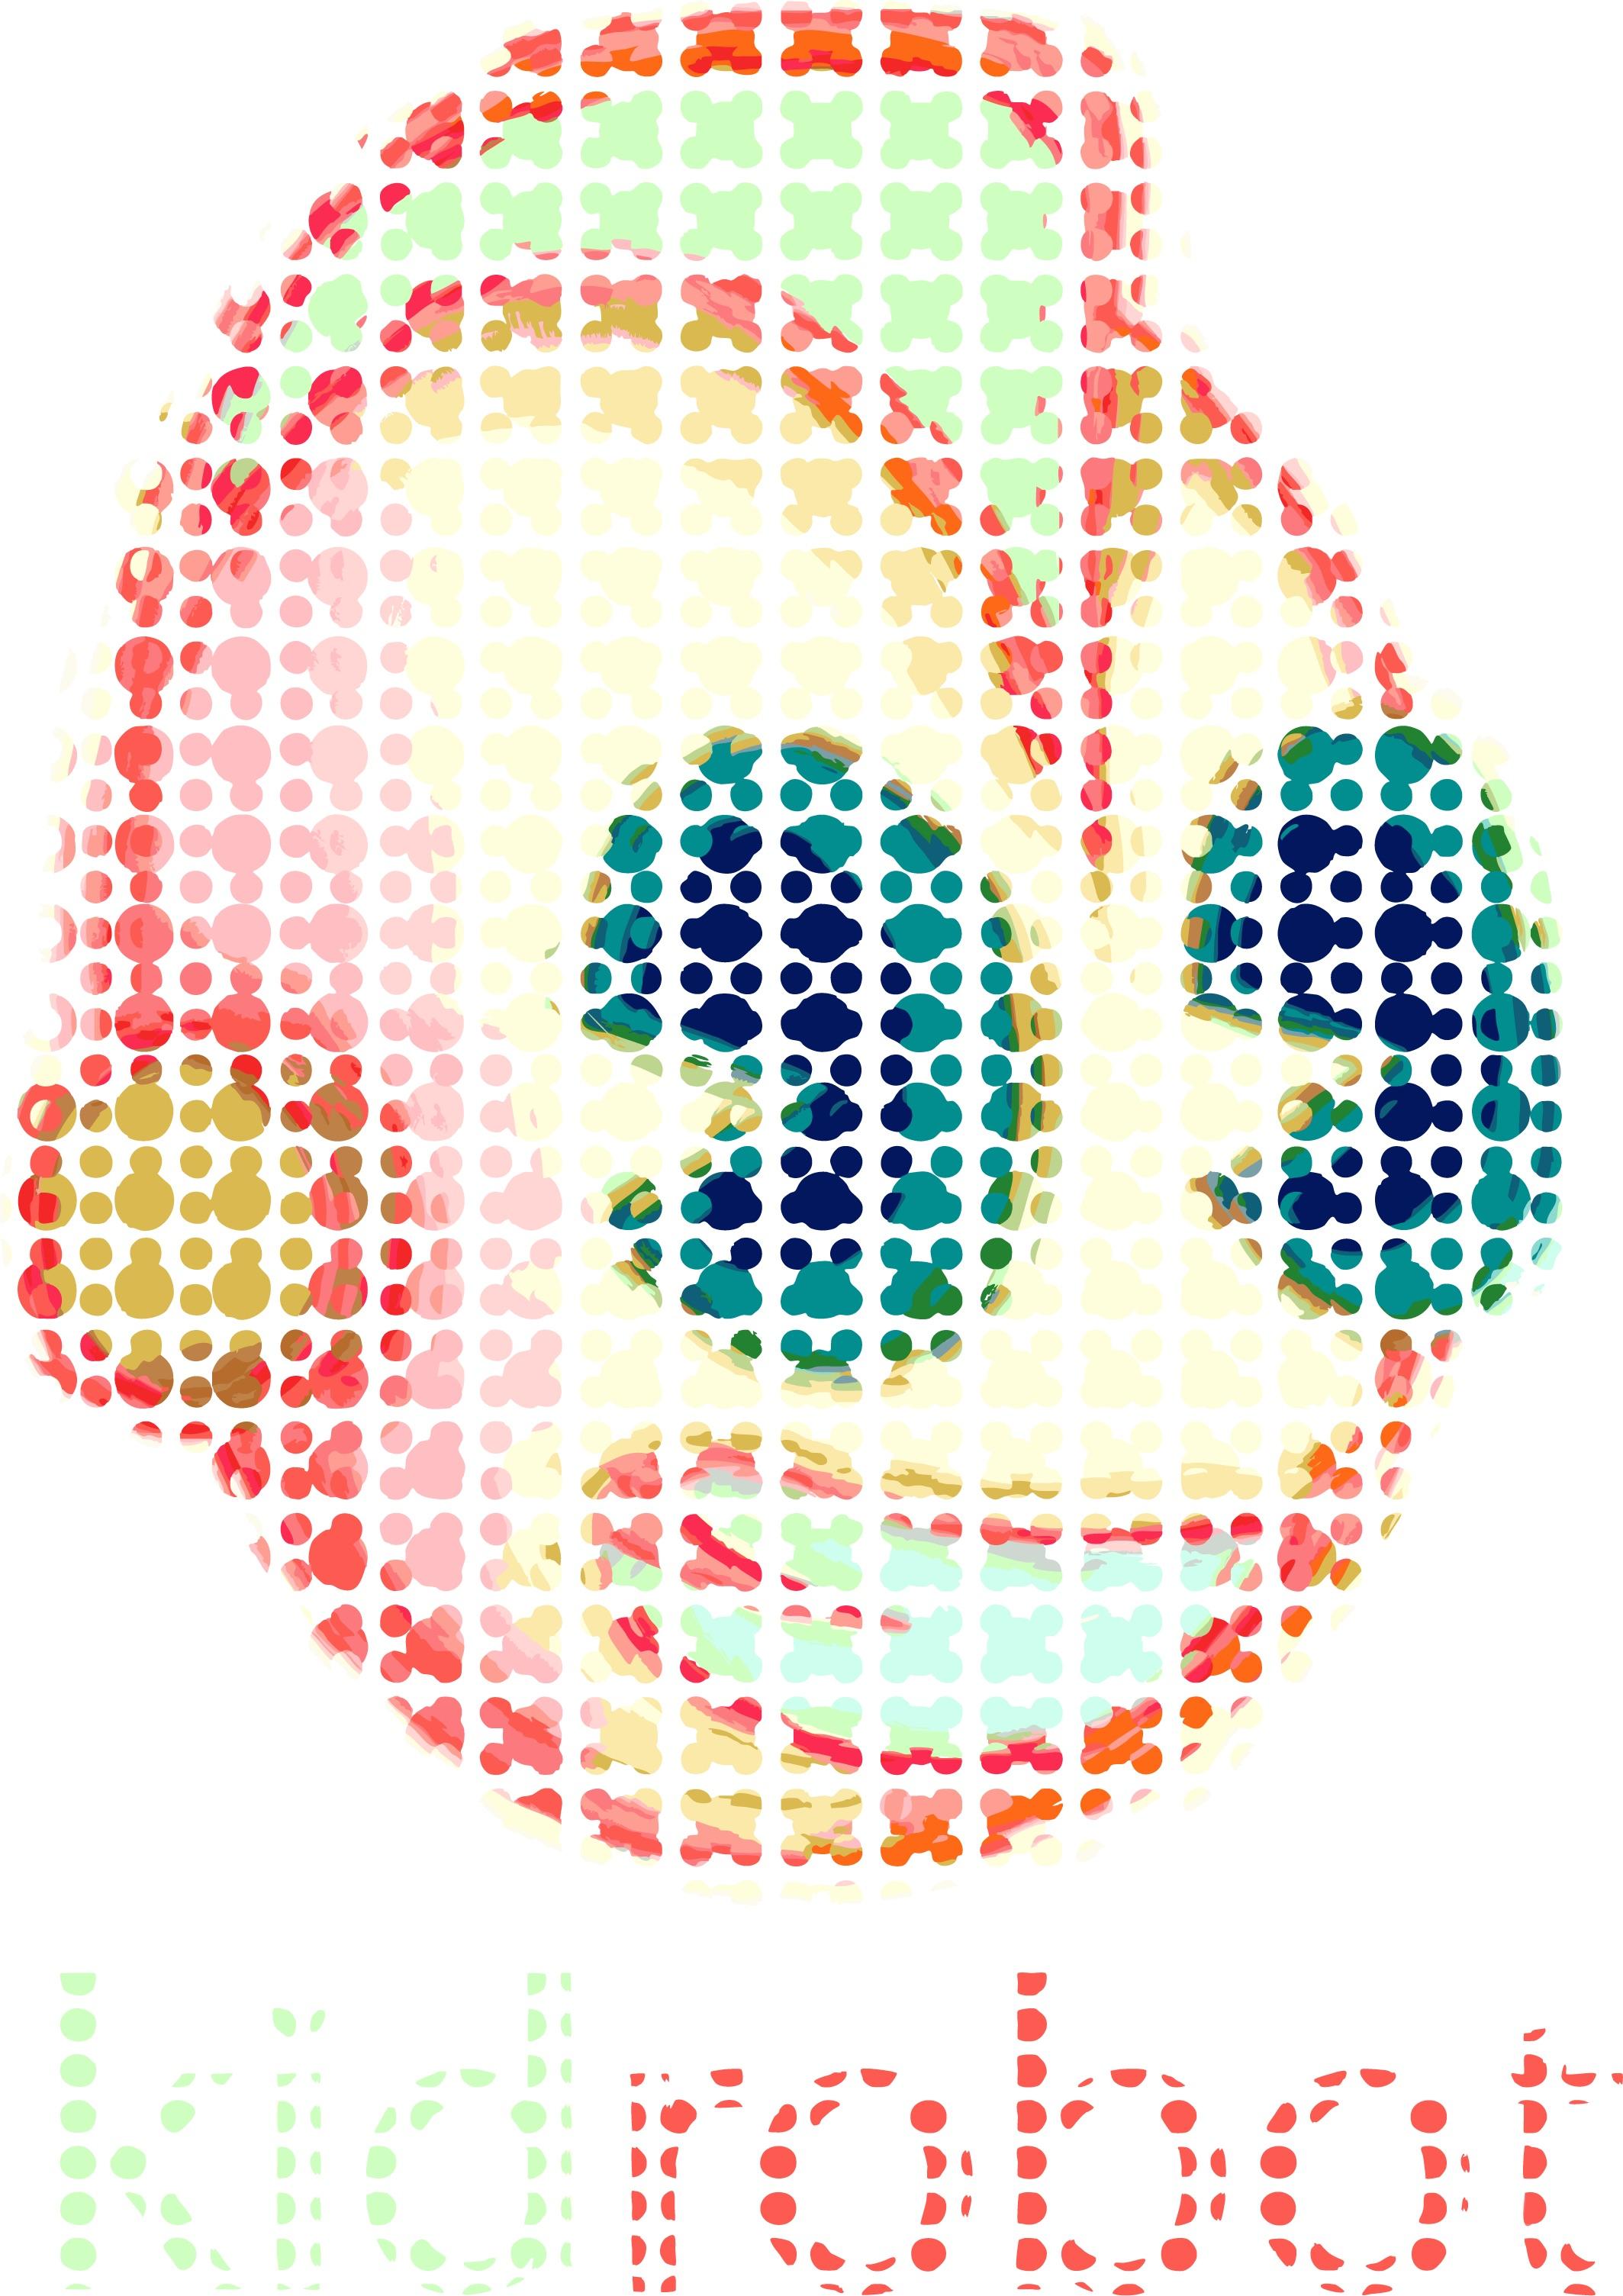 kidrobot15B after illustrator.jpg